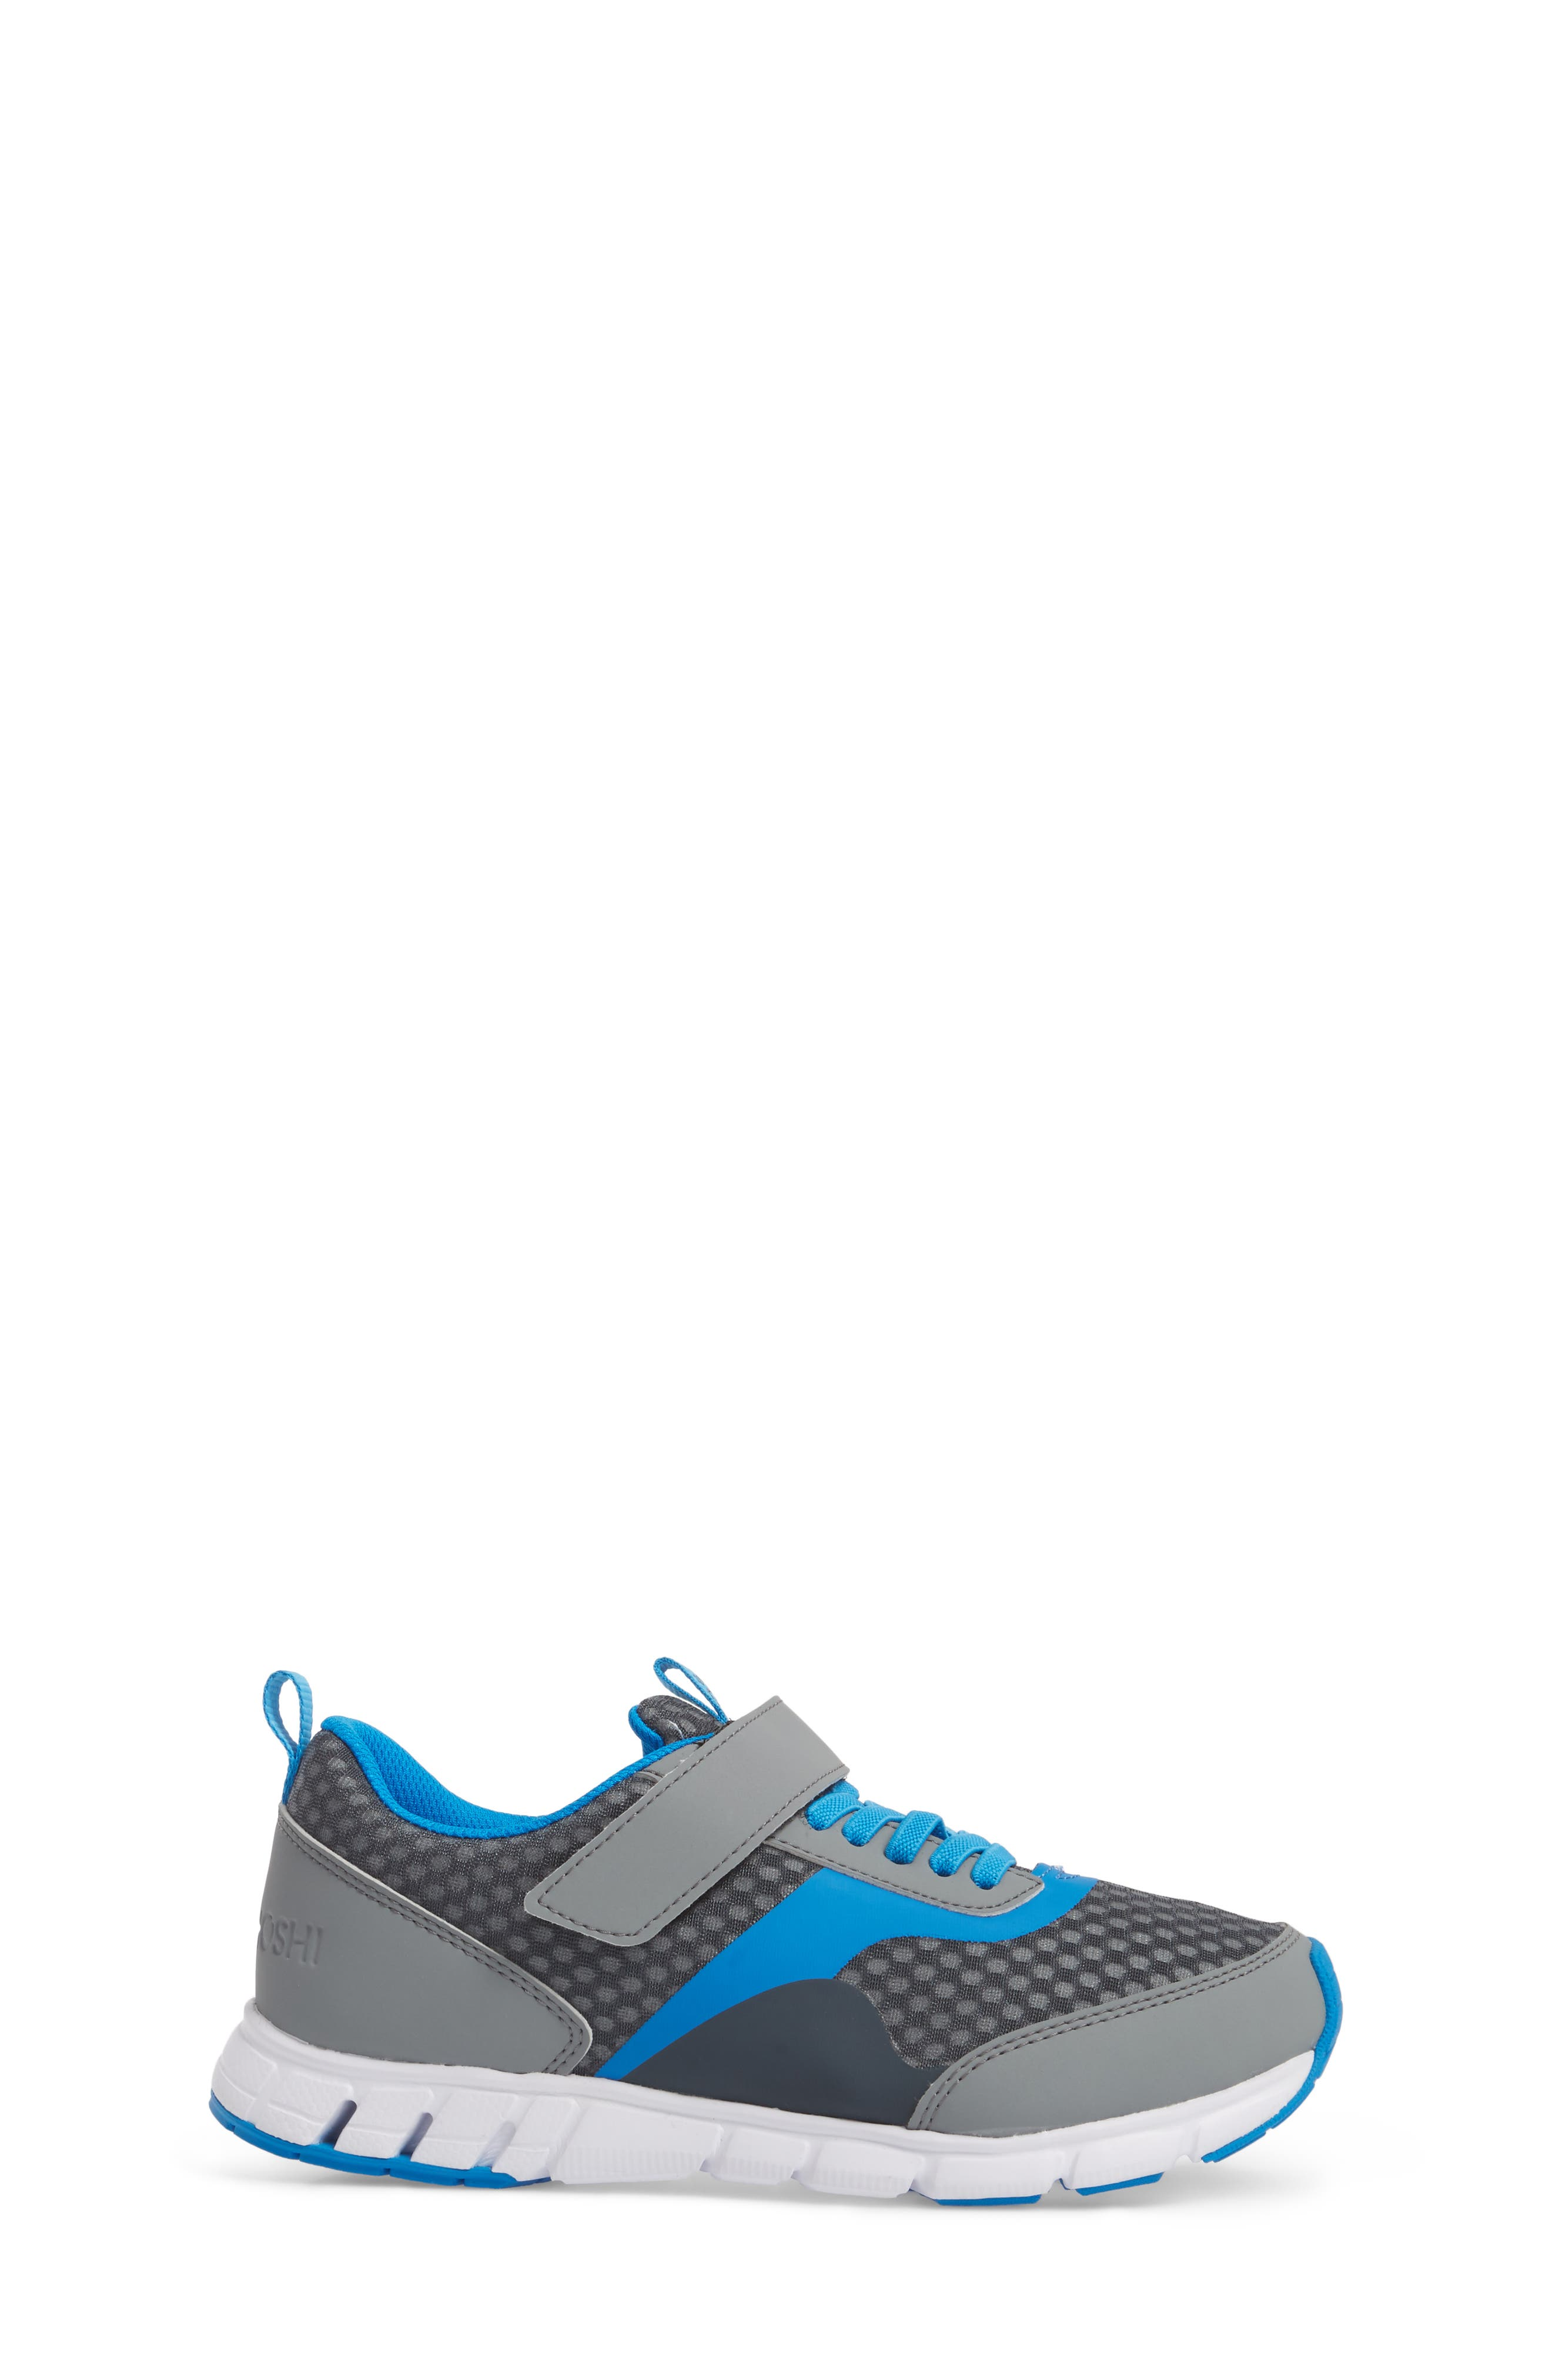 Sonic Washable Sneaker,                             Alternate thumbnail 3, color,                             Gray/ Royal